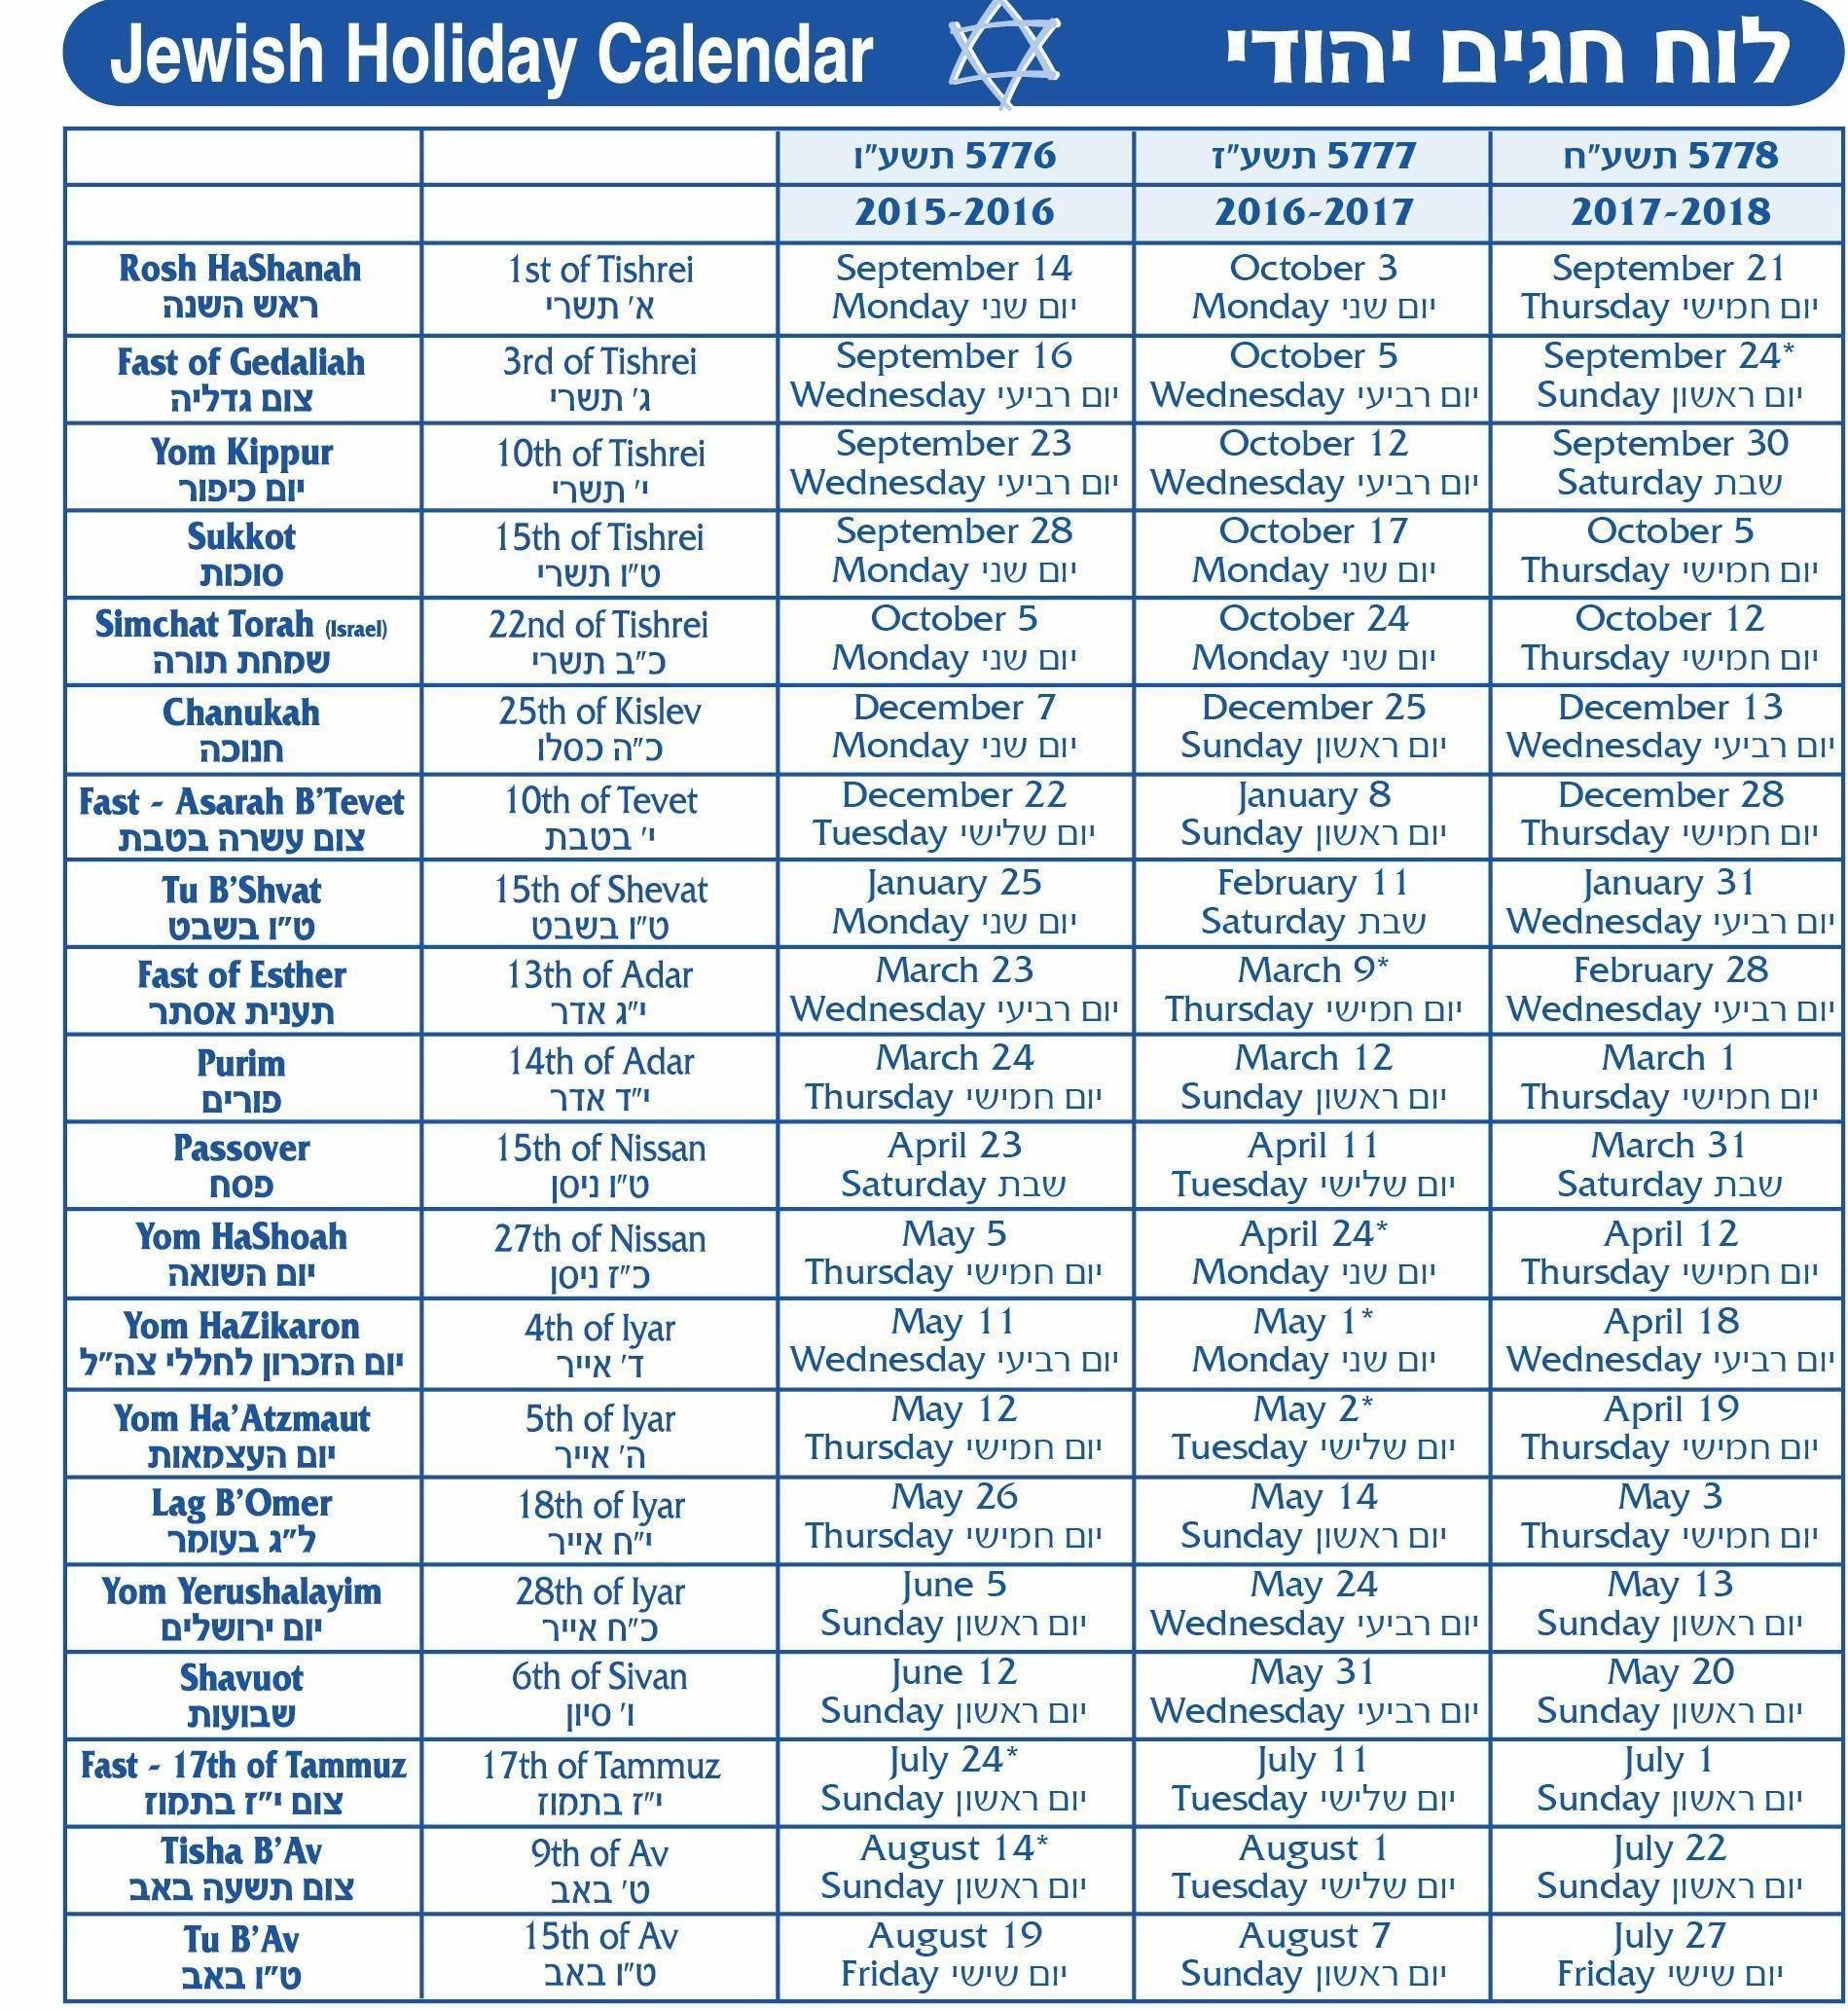 2018 Holiday Calendar - Usa, Federal, Jewish - Web E-Dates Of Jewish Holidays